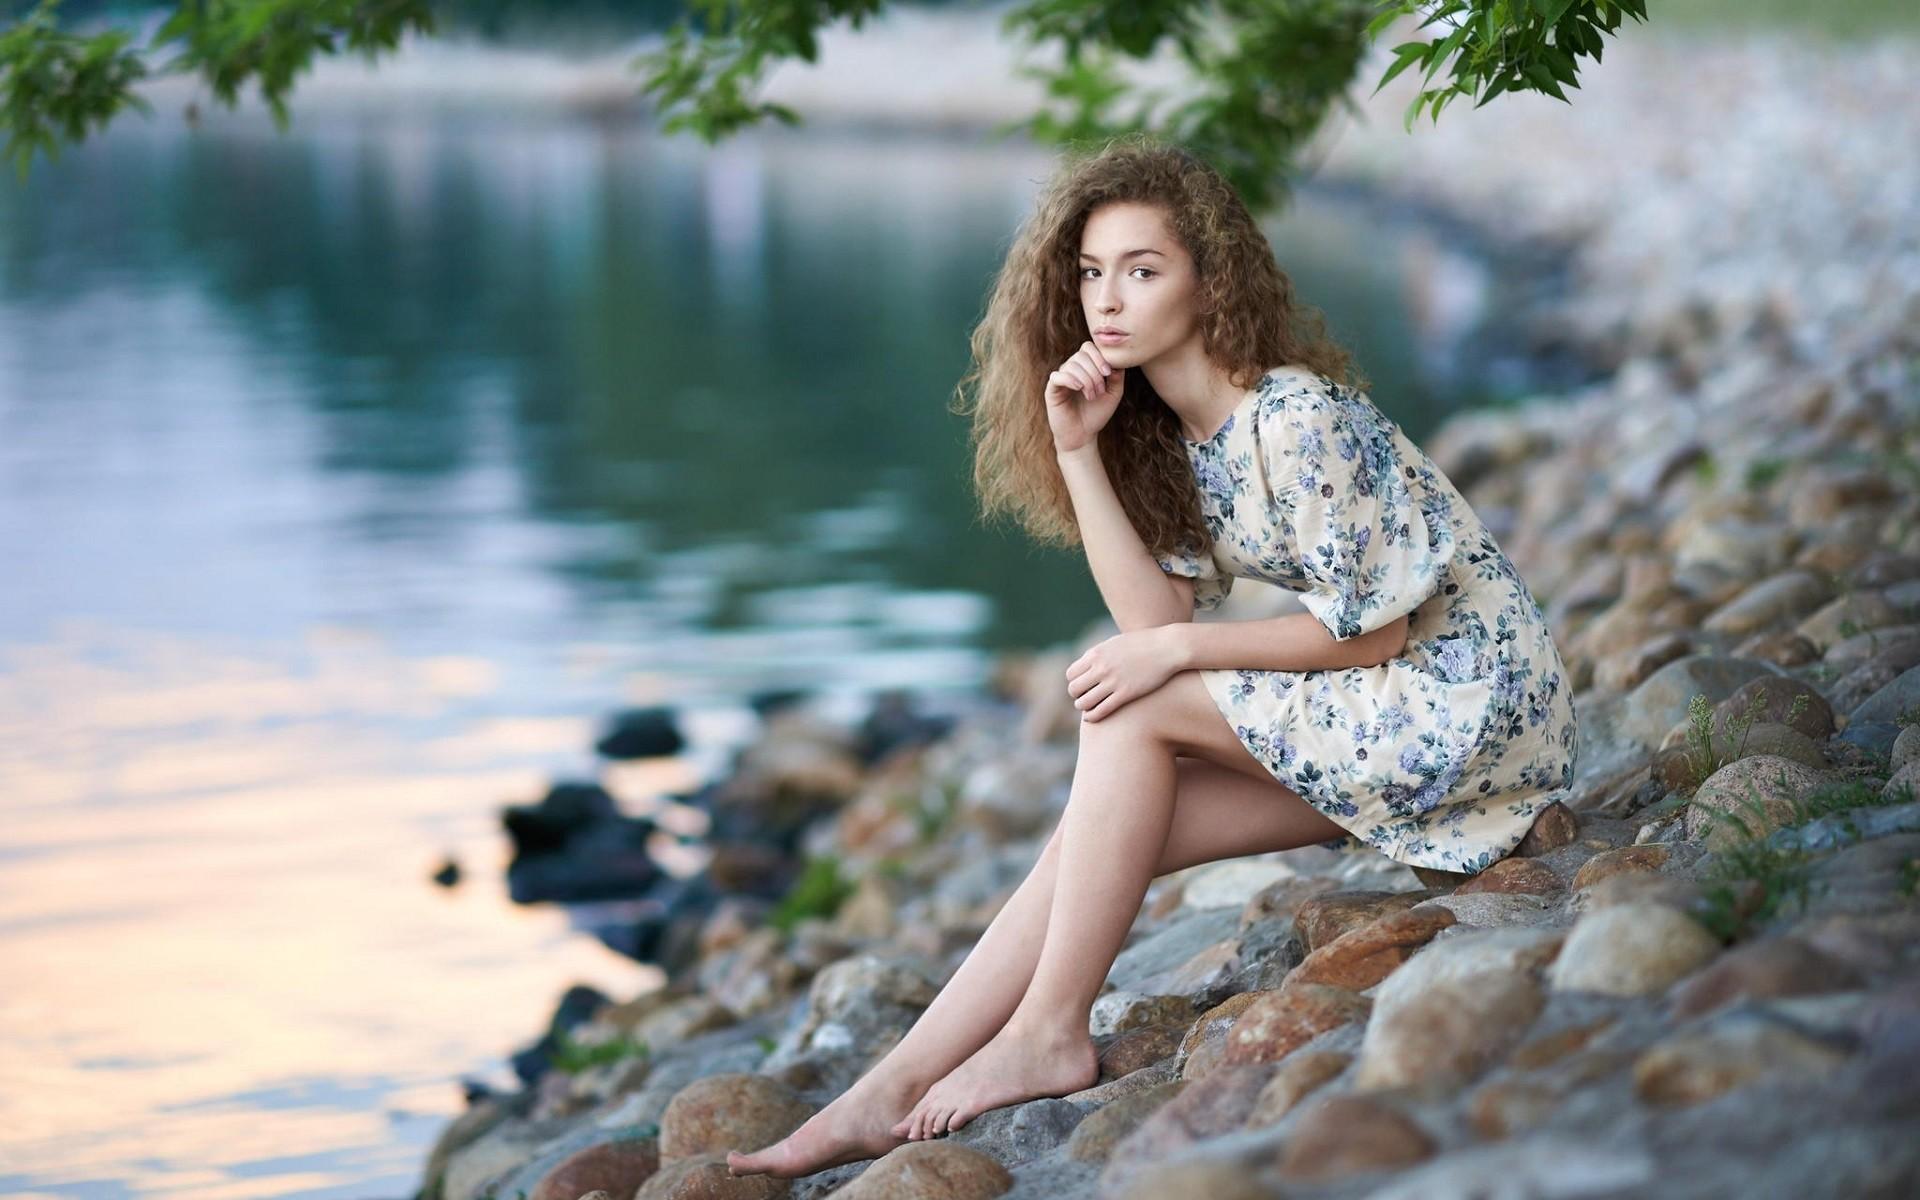 https://get.wallhere.com/photo/sunlight-women-outdoors-women-model-portrait-long-hair-lake-nature-barefoot-stones-legs-photography-dress-curly-hair-fashion-stone-spring-Person-Lisa-Alexanina-tree-girl-beauty-season-woman-leg-photograph-human-positions-portrait-photography-photo-shoot-51885.jpg